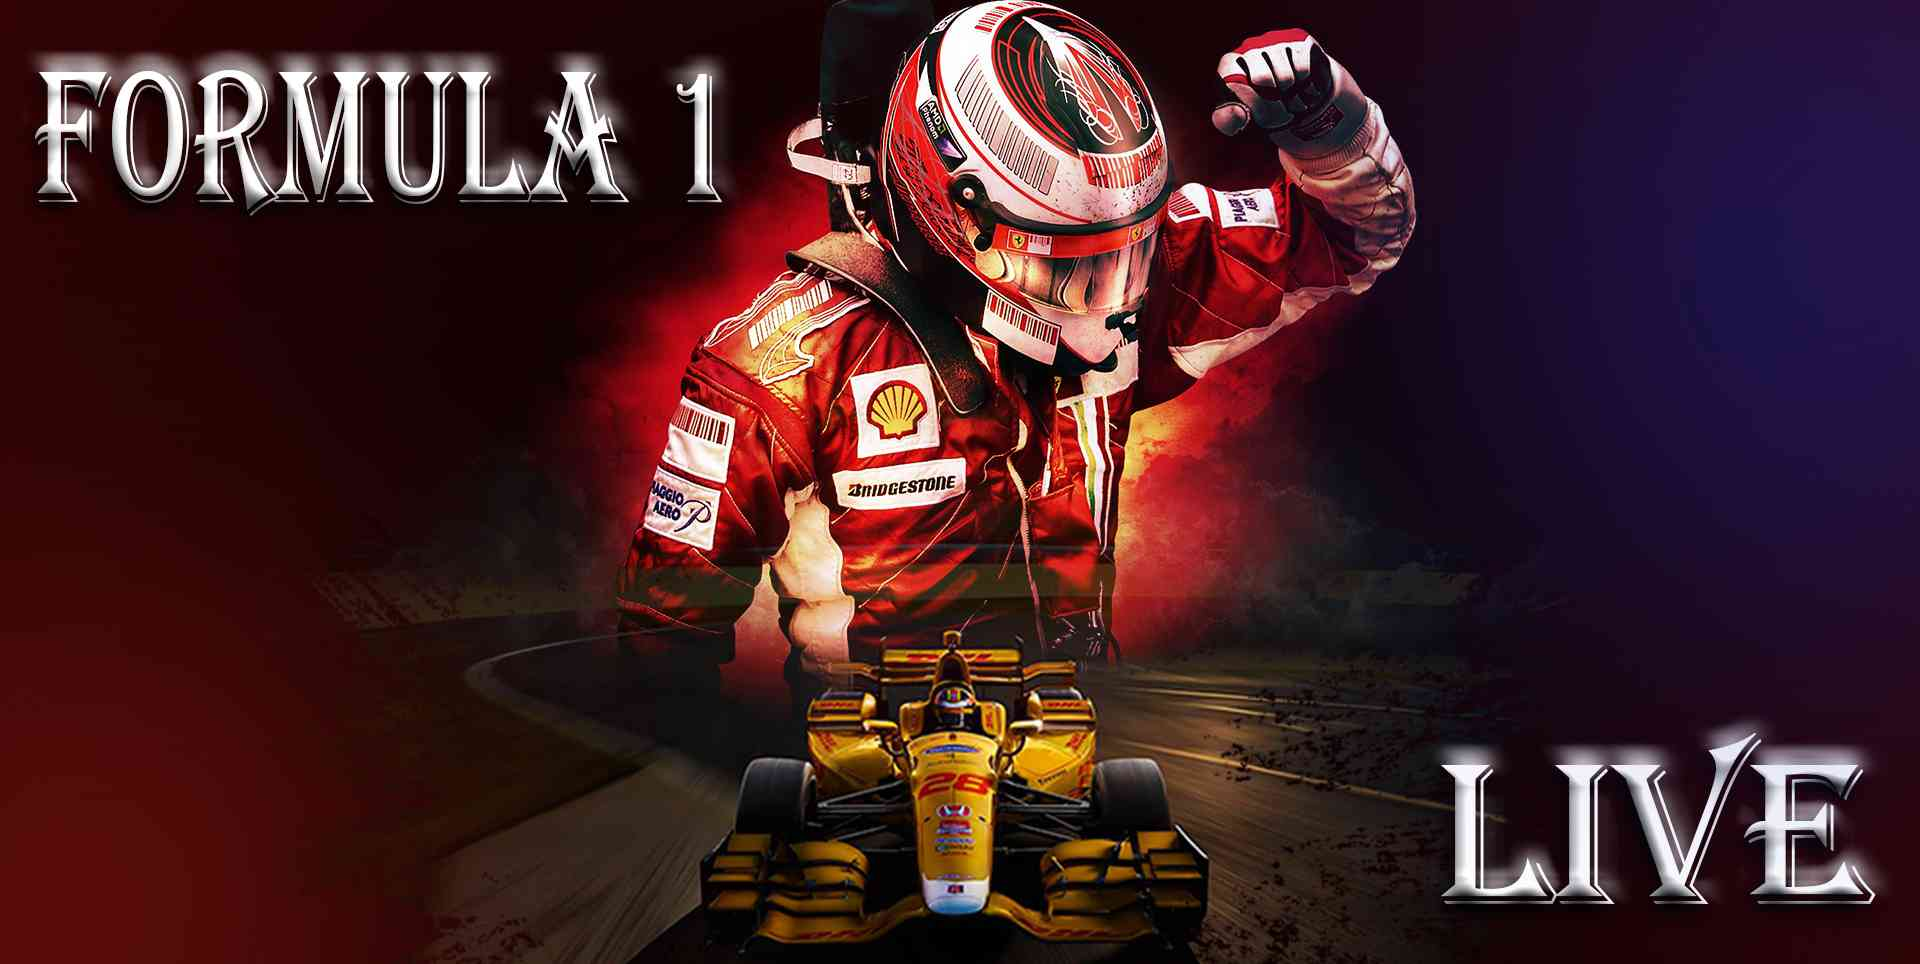 2016-formula-1-grand-prix-of-europe-live